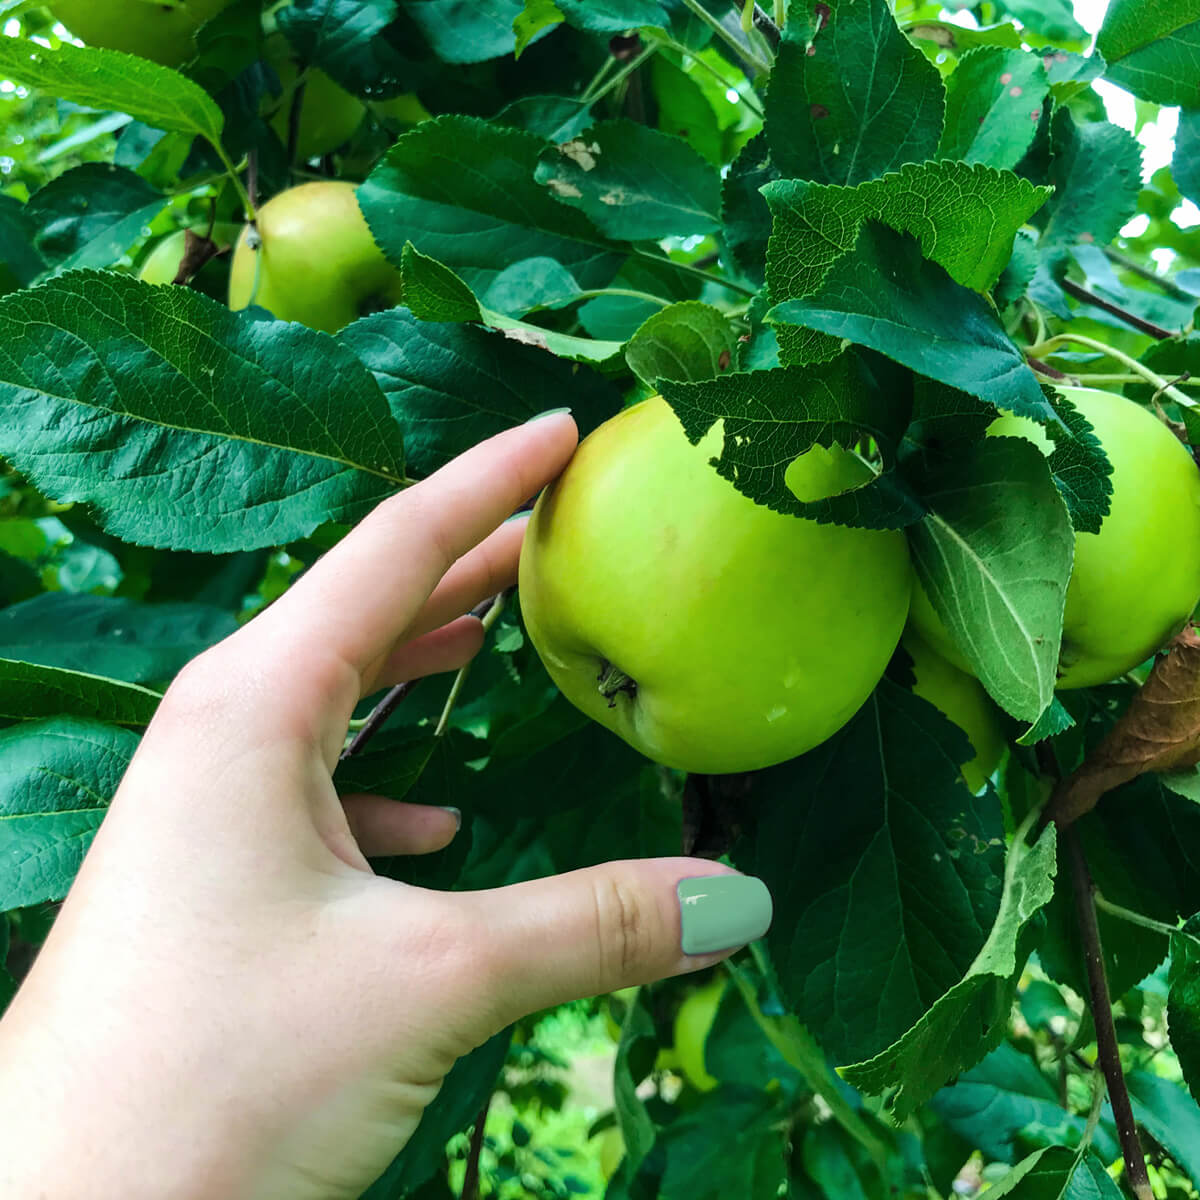 Delicious green apples ensure the intense fruity taster in EFFEN Apple Vodka.